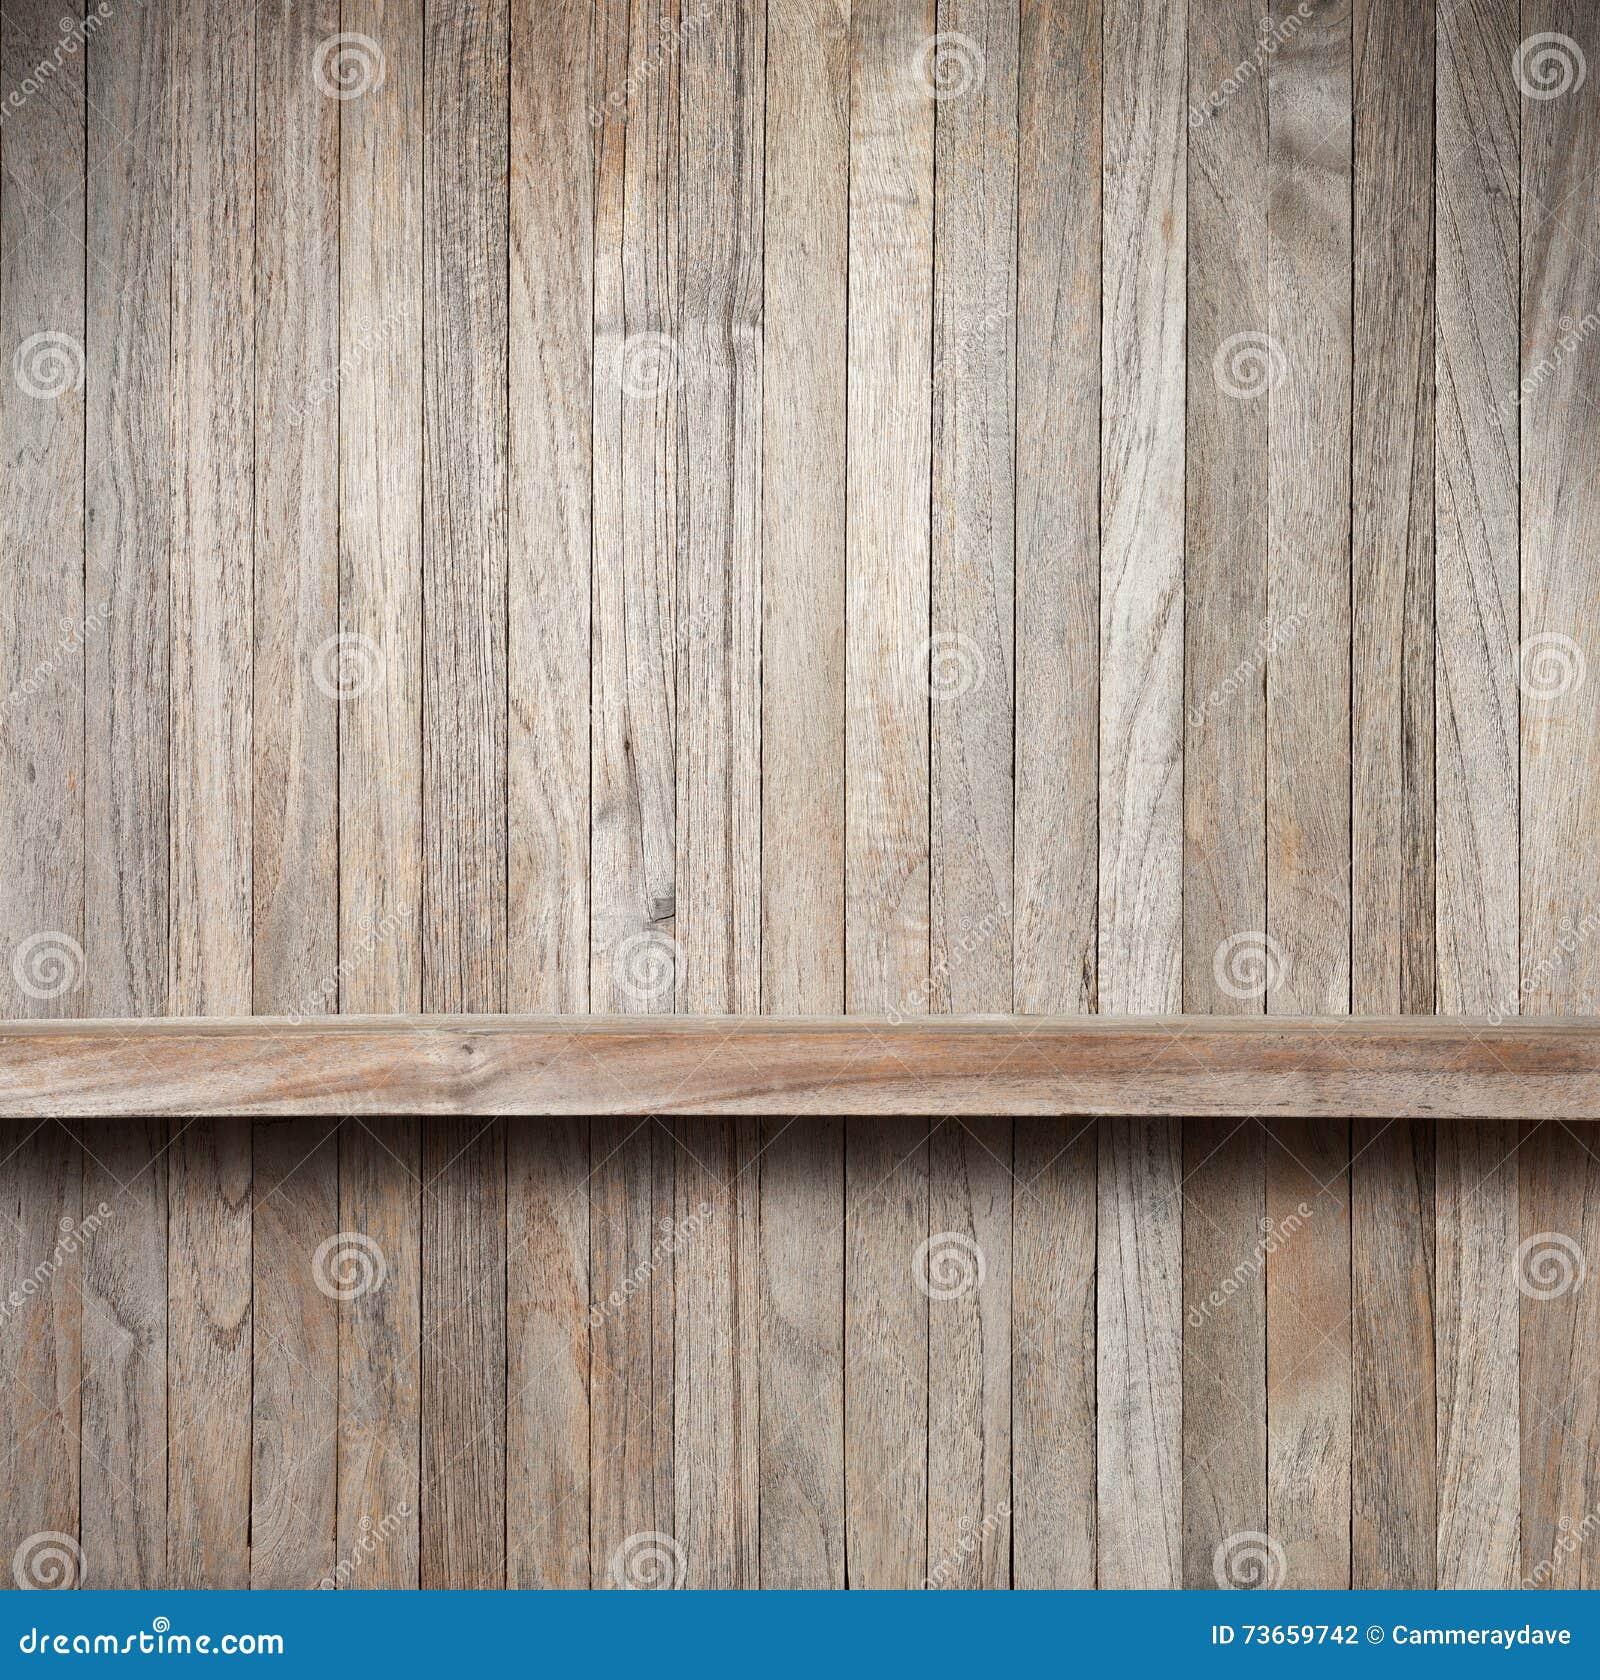 Rustic Wood Shelf Background Stock Photo